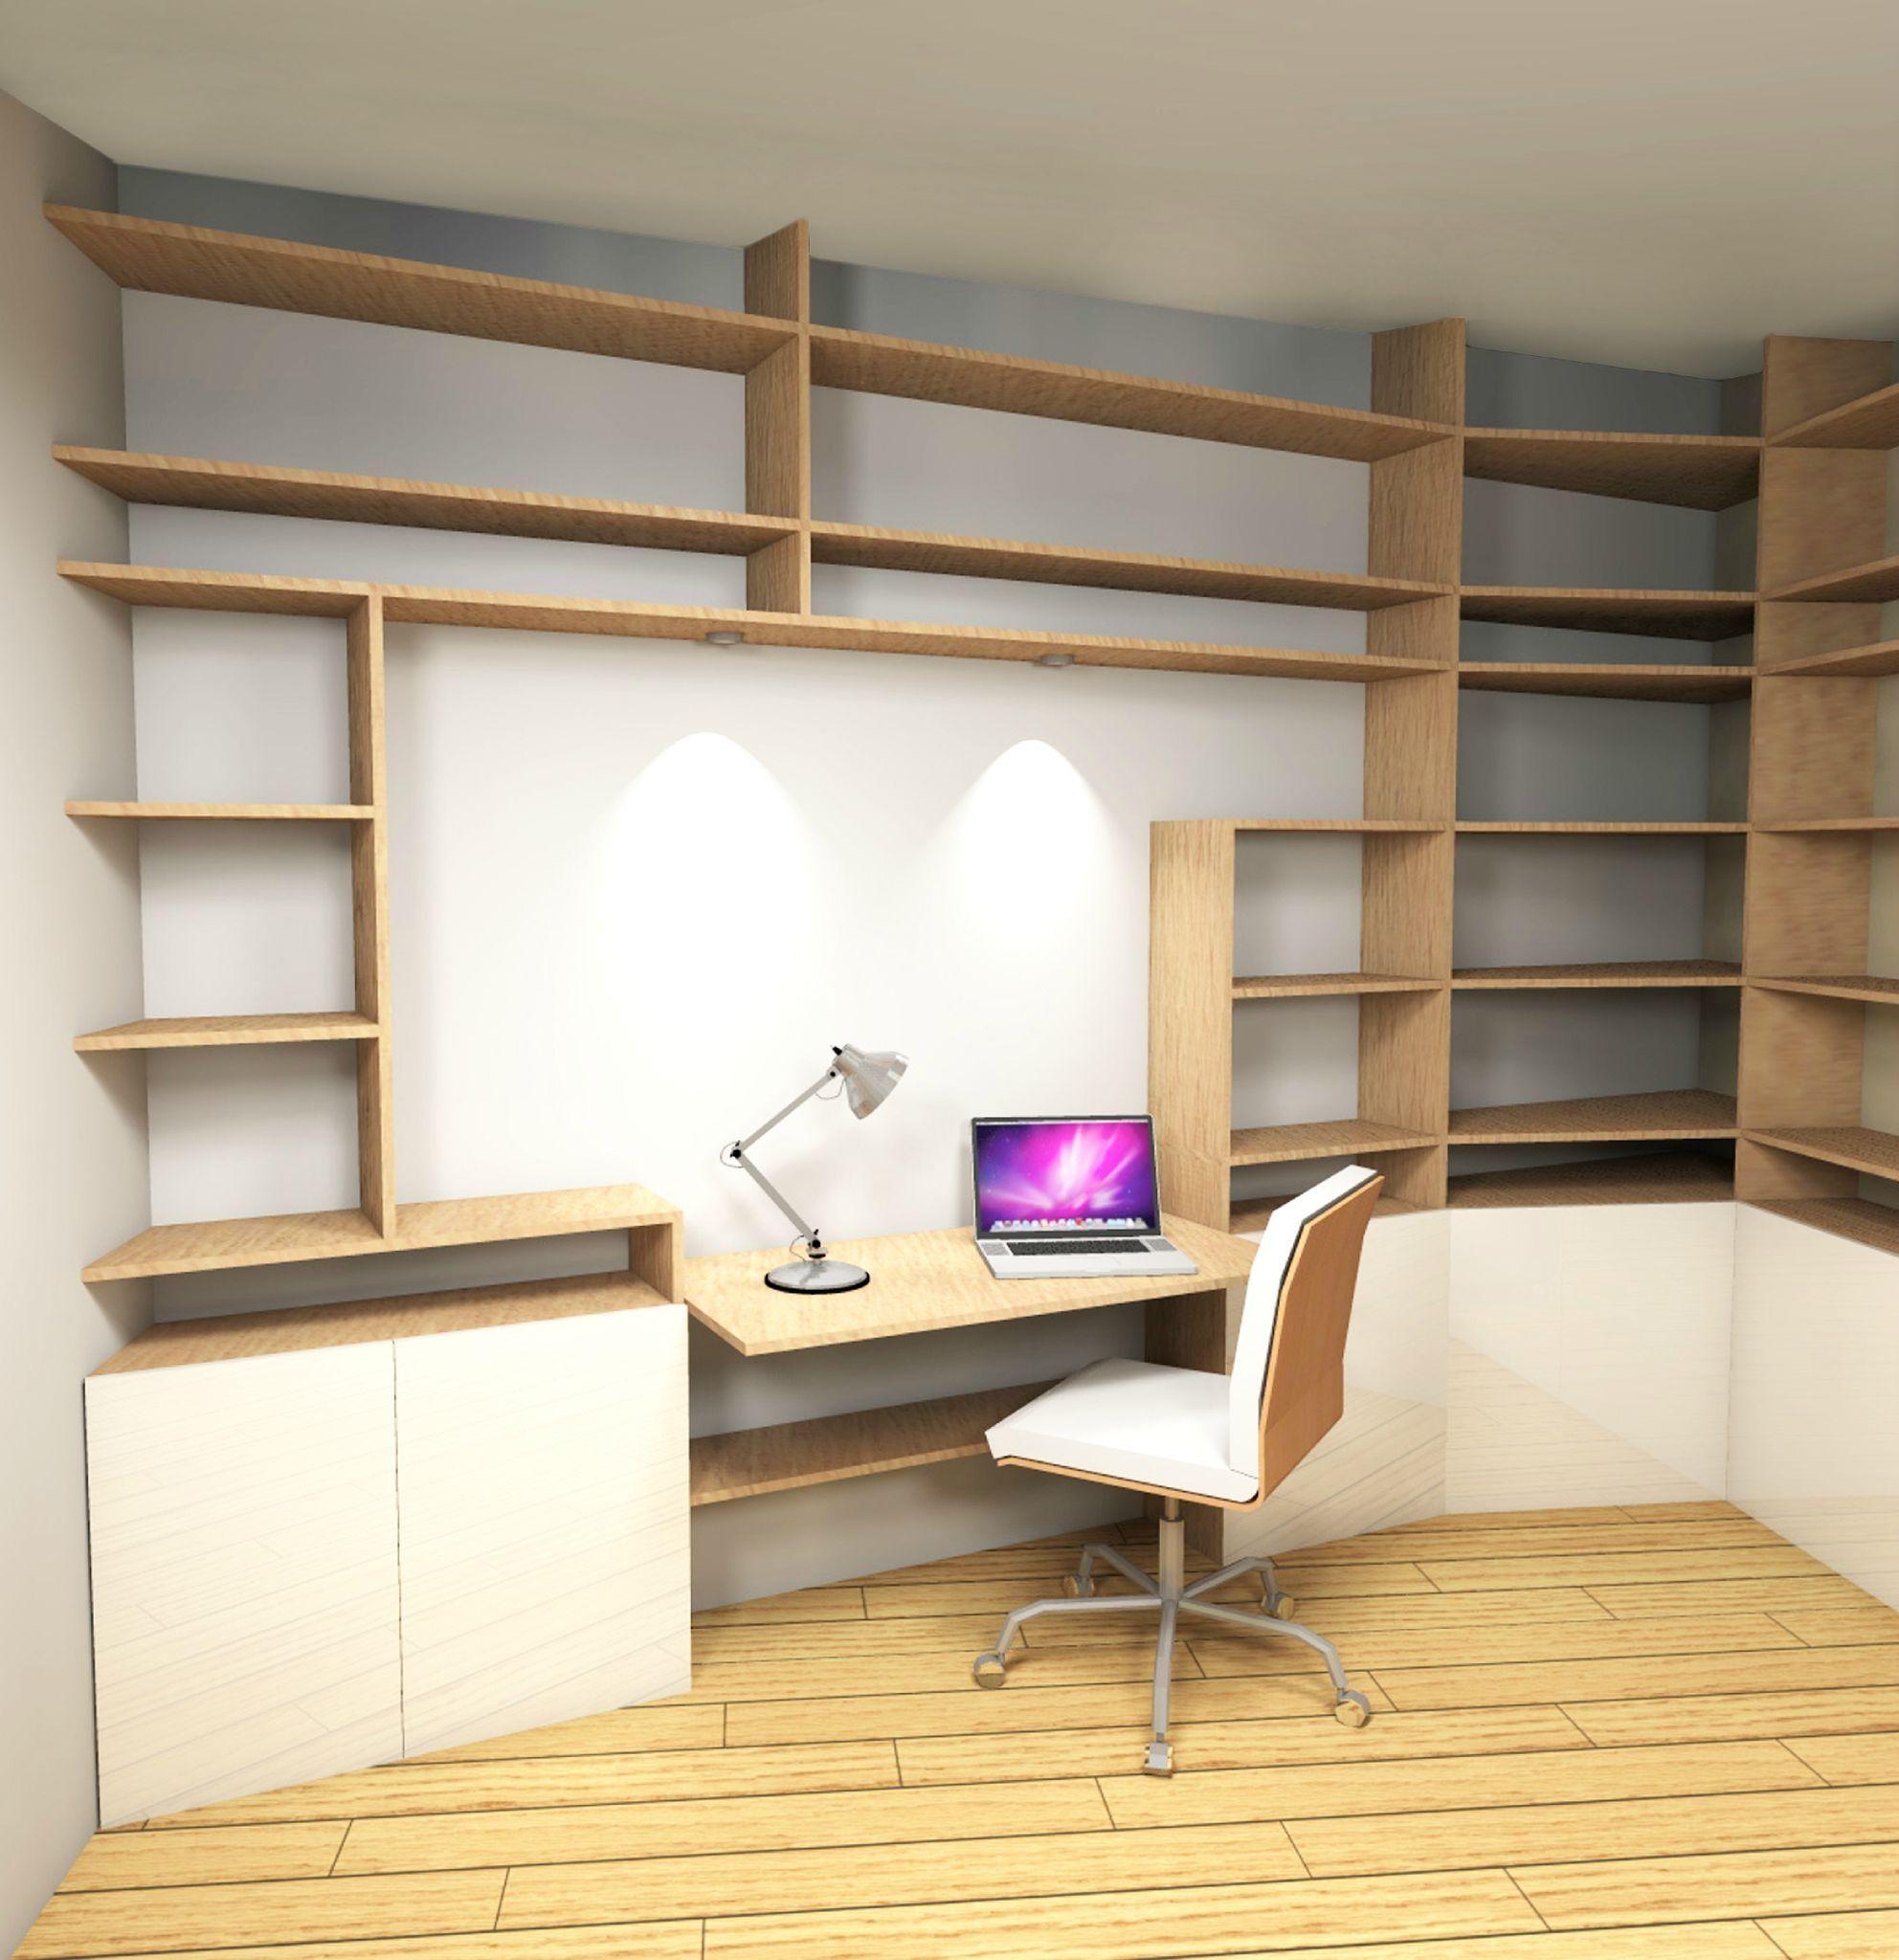 Conception espace bureau chambre ami stinside architecture d 39 int rieur bureau chambre - Chambre interieur ...